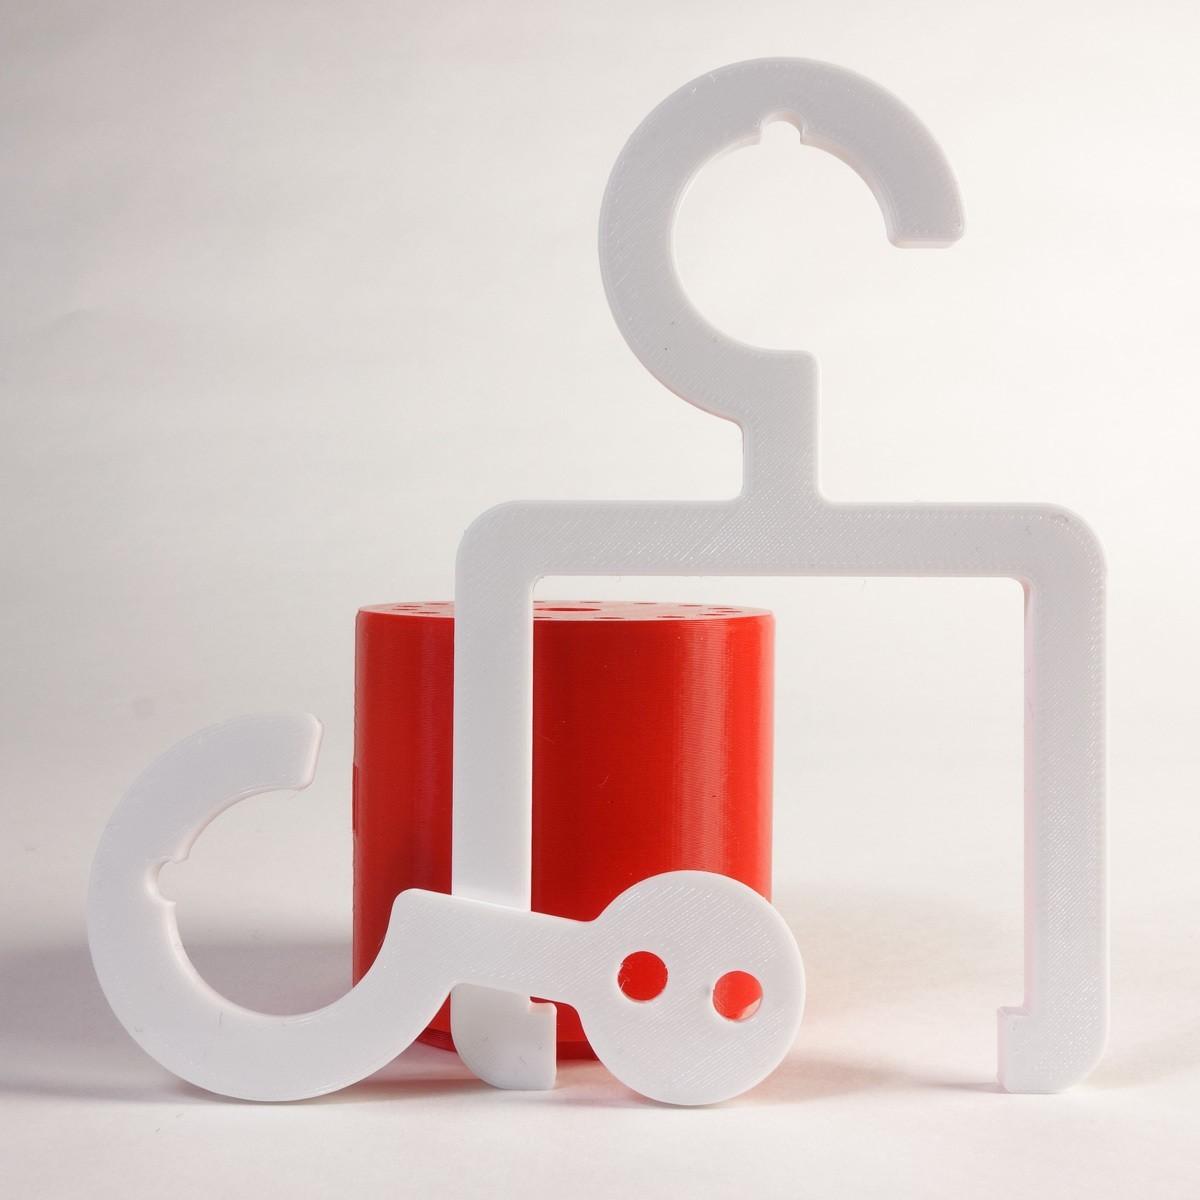 Marilyn_hooks.jpg Download STL file MARILYN • 3D print model, svdv